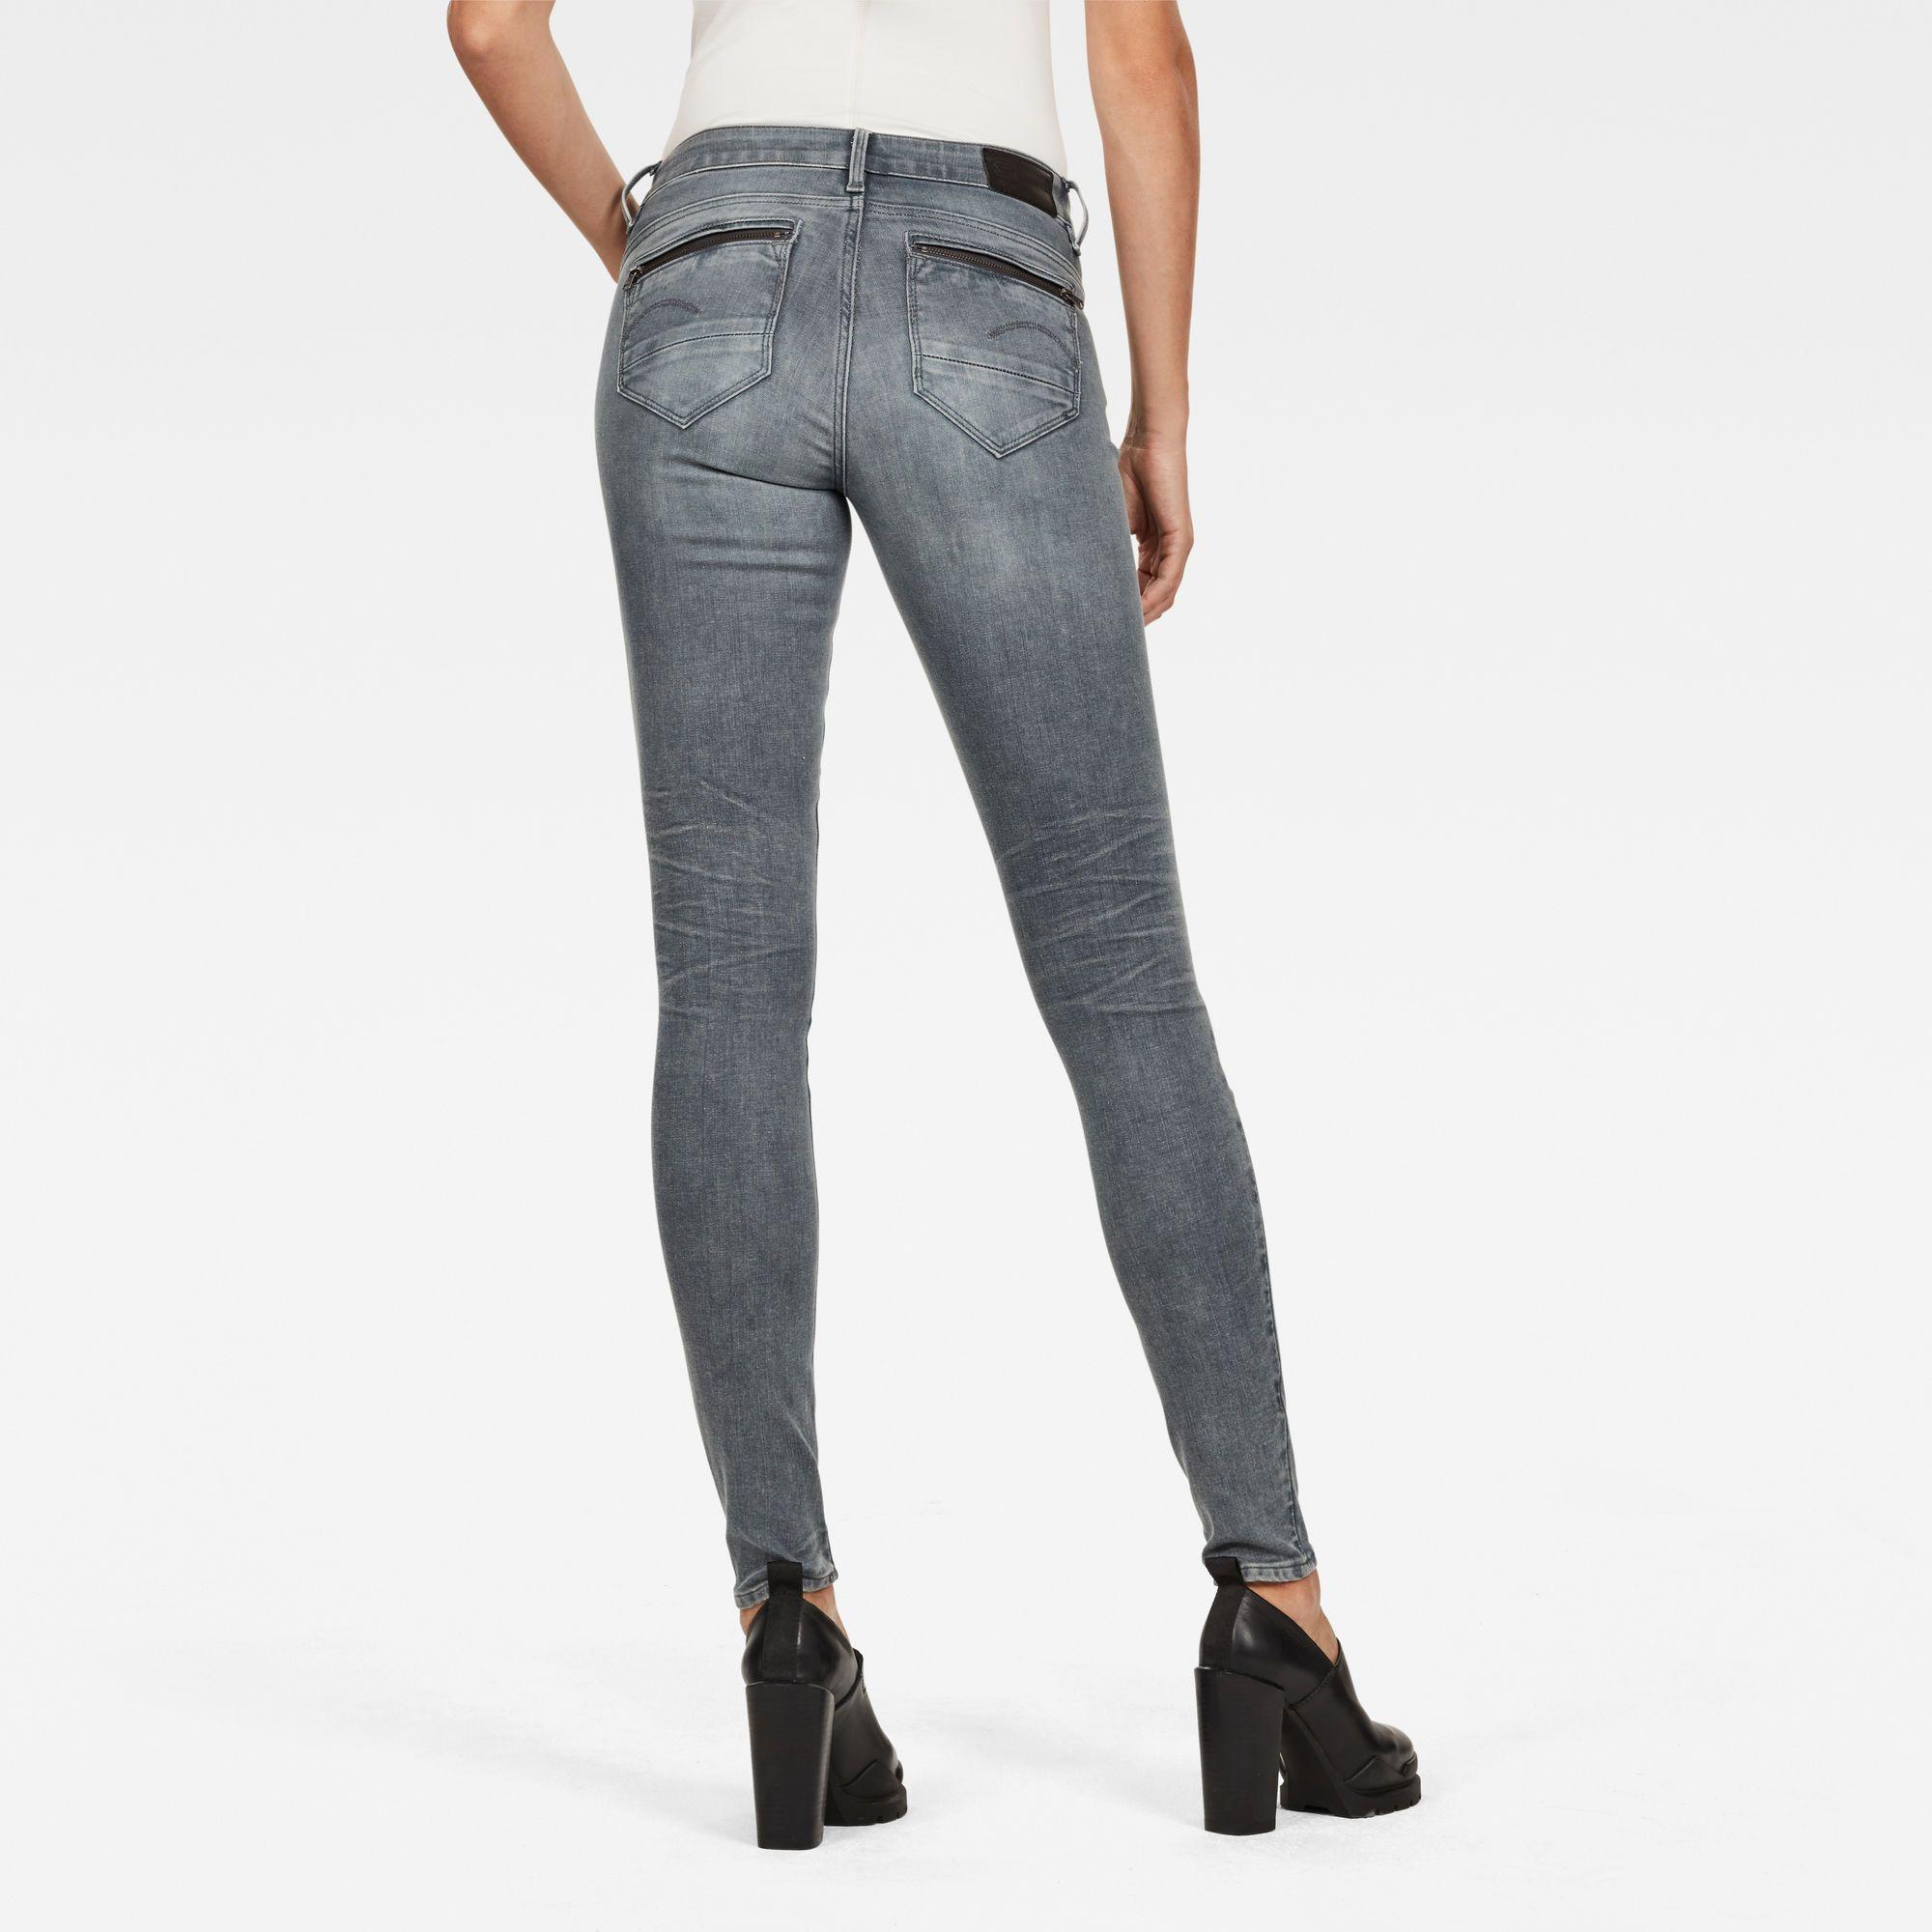 G-Star RAW Midge Zip Mid Waist Skinny Color Jeans